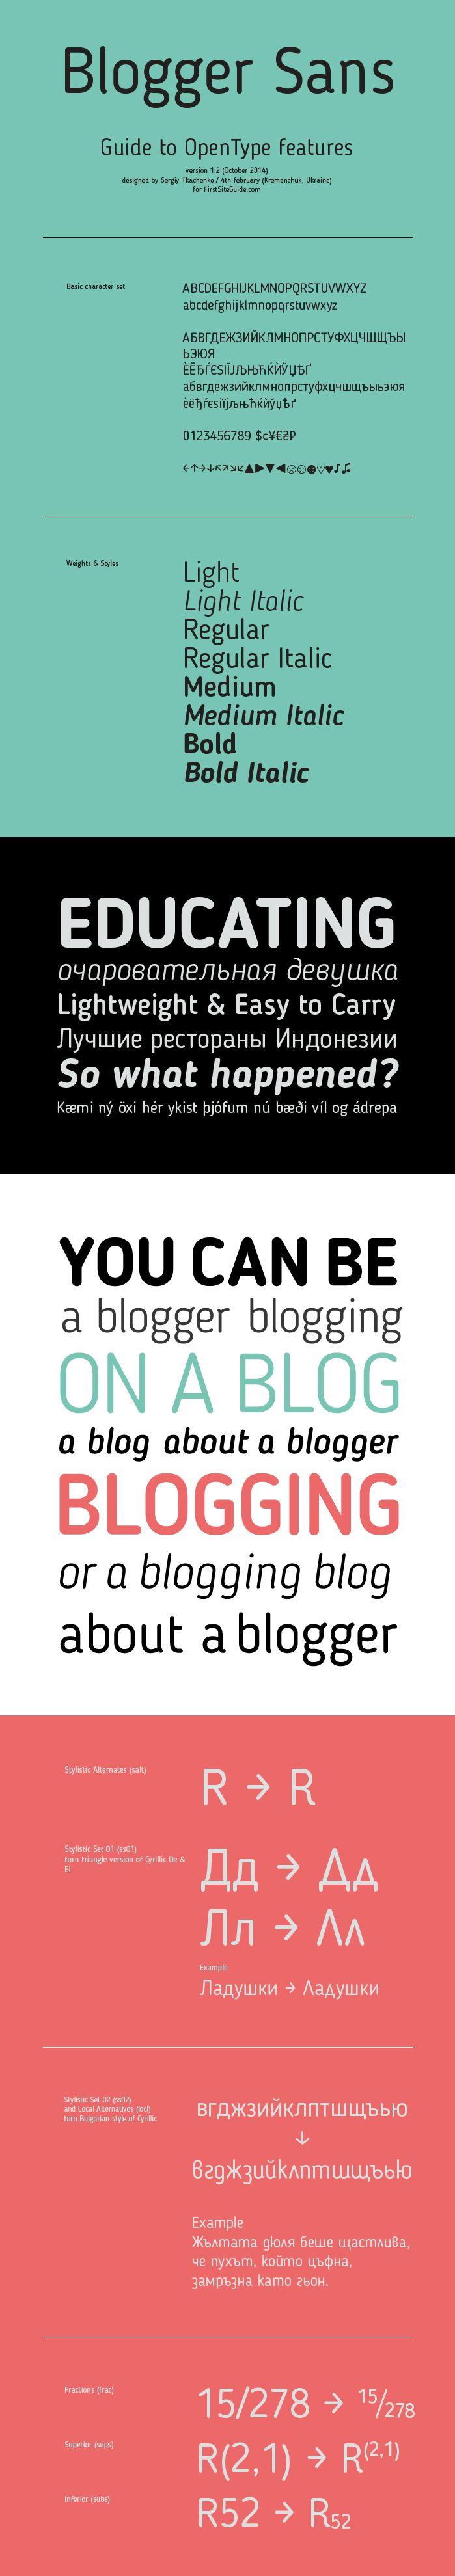 Blogger Sans - Fontfabric